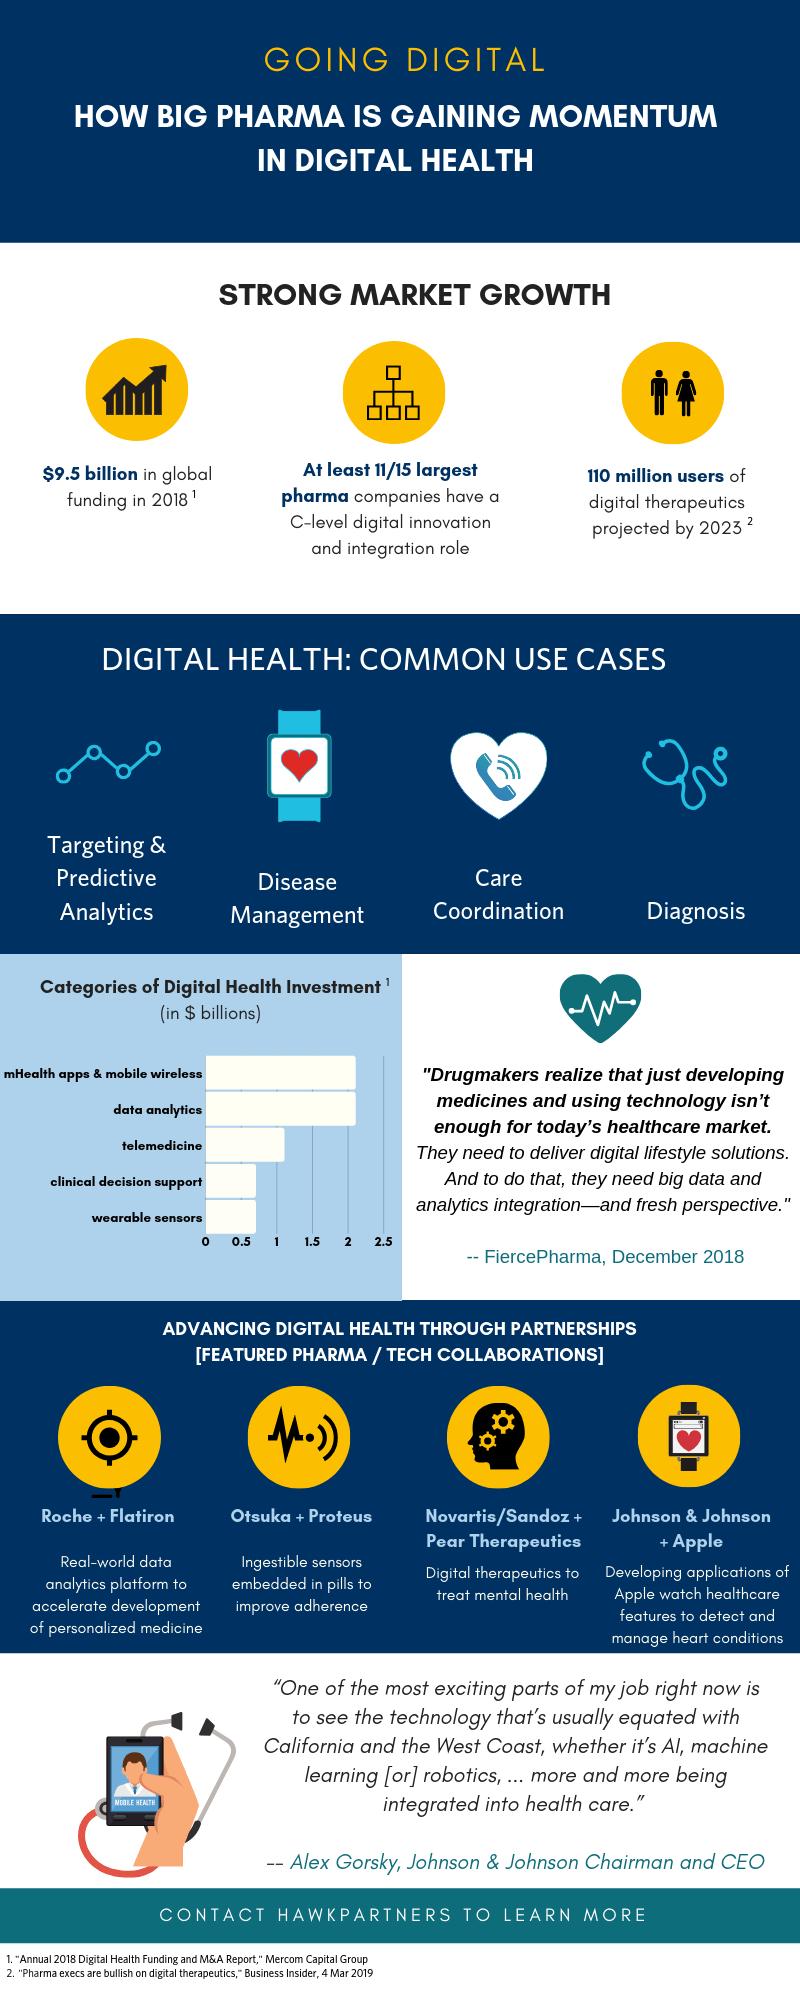 How Big Pharma is Gaining Momentum in Digital Health